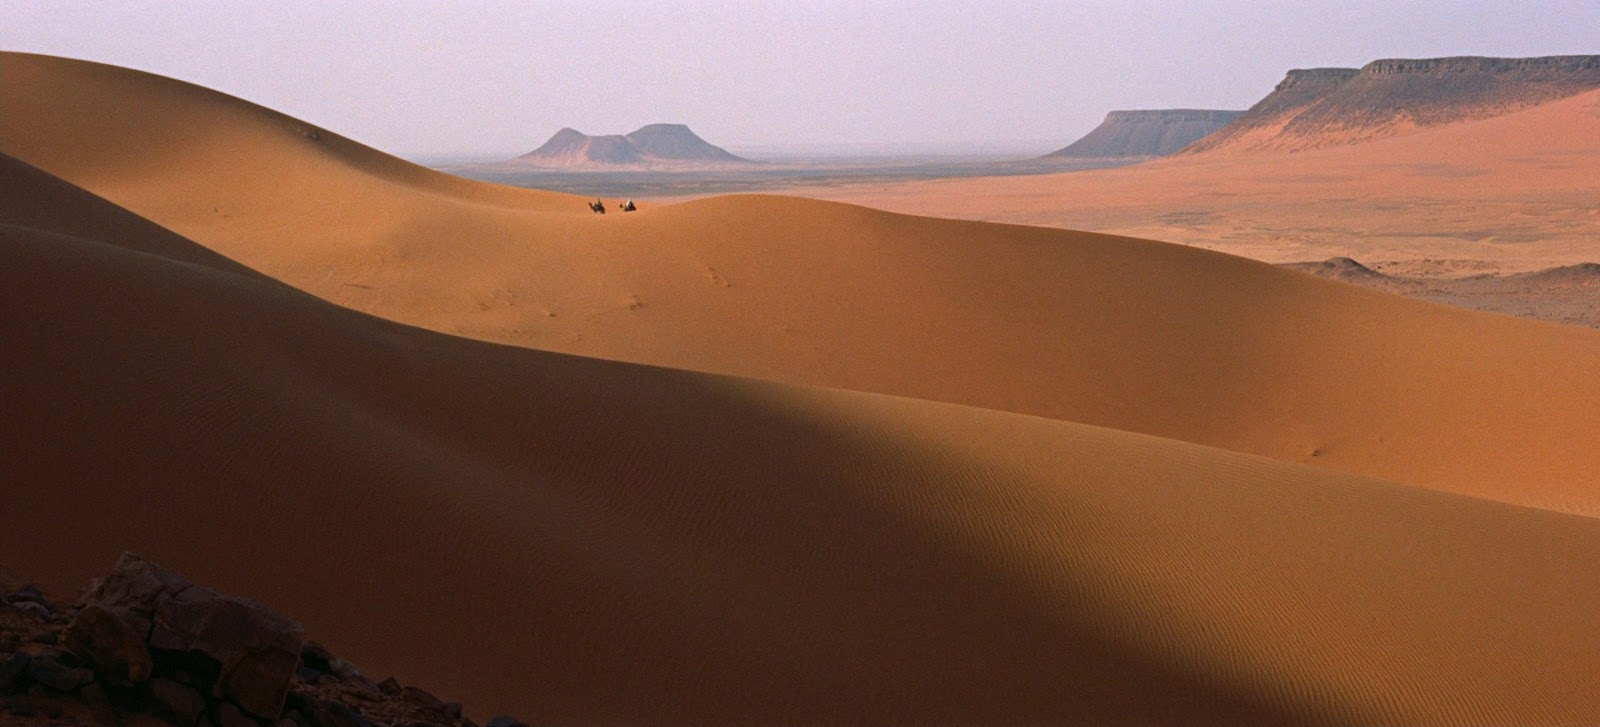 Lawrence+of+Arabia+HD+008.jpg